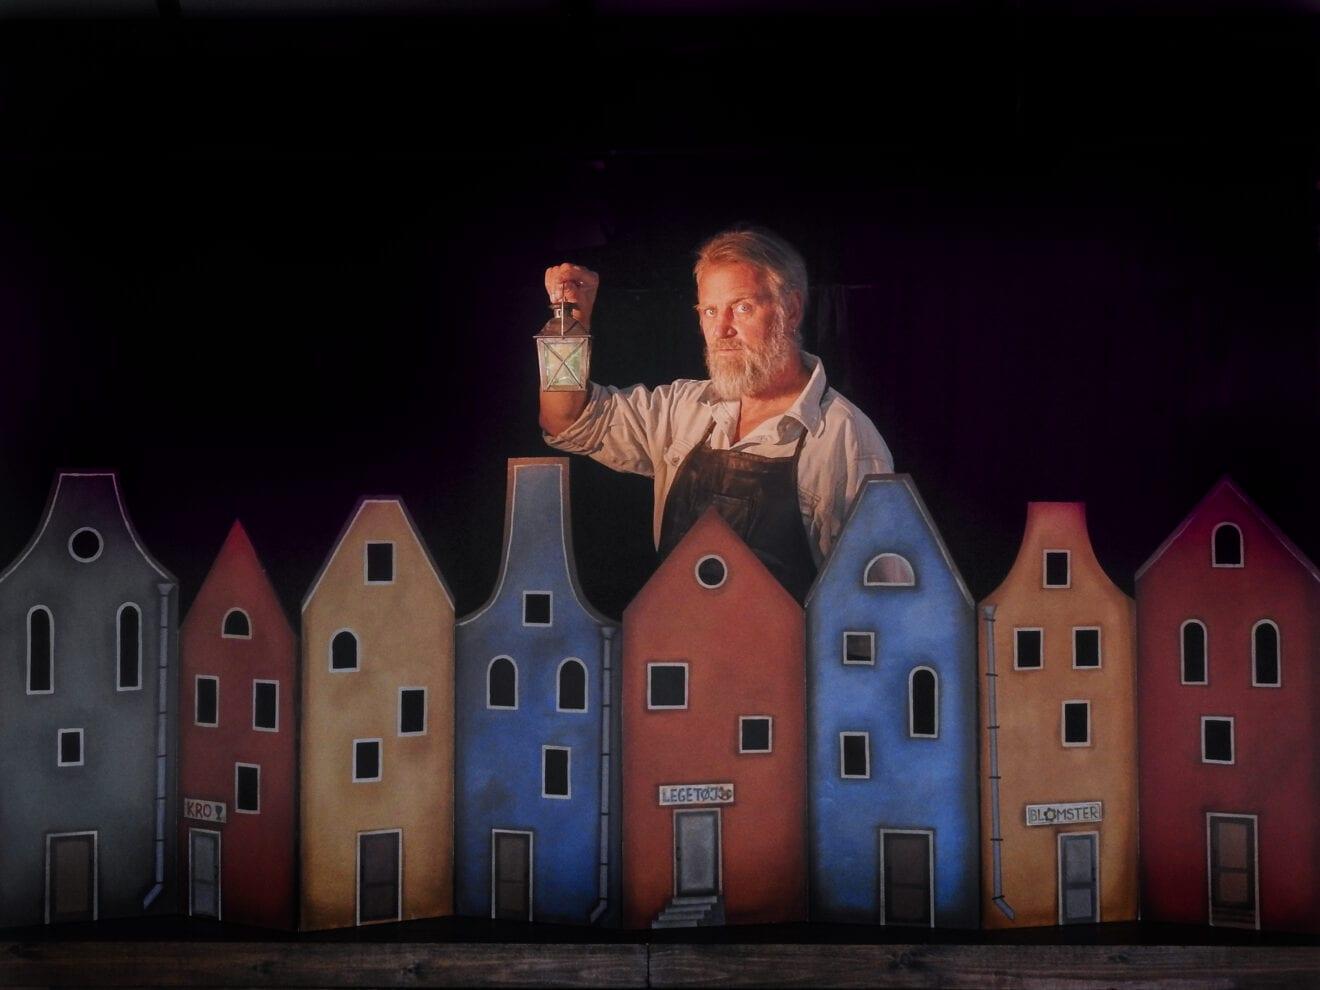 Genåbning på Teatret FAIR PLAY med anmelderrost forestilling for hele familien!